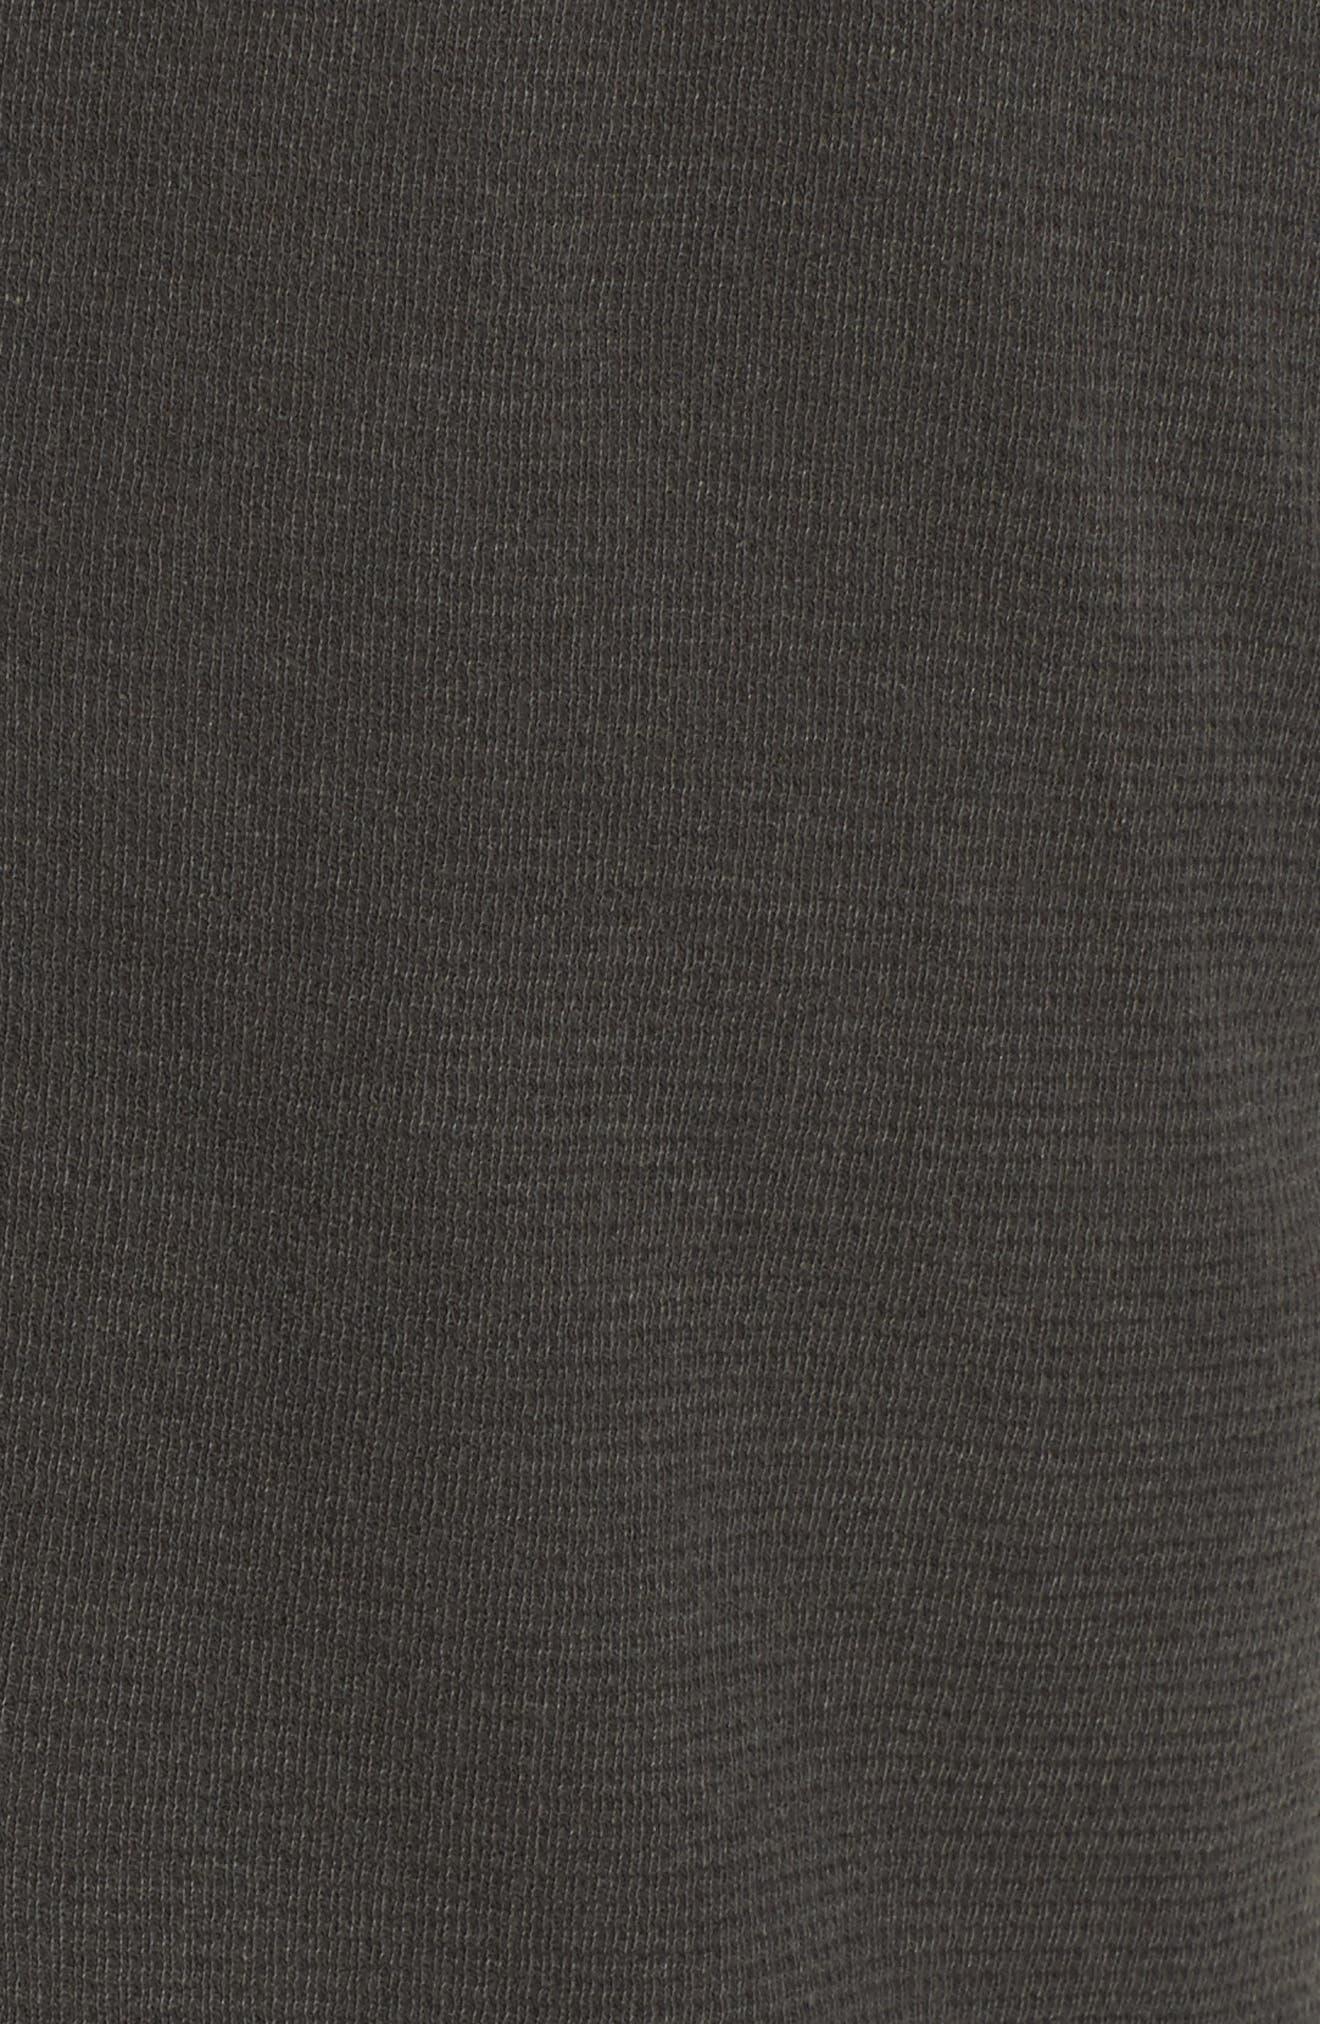 Lace-Up Bib Thermal Top,                             Alternate thumbnail 13, color,